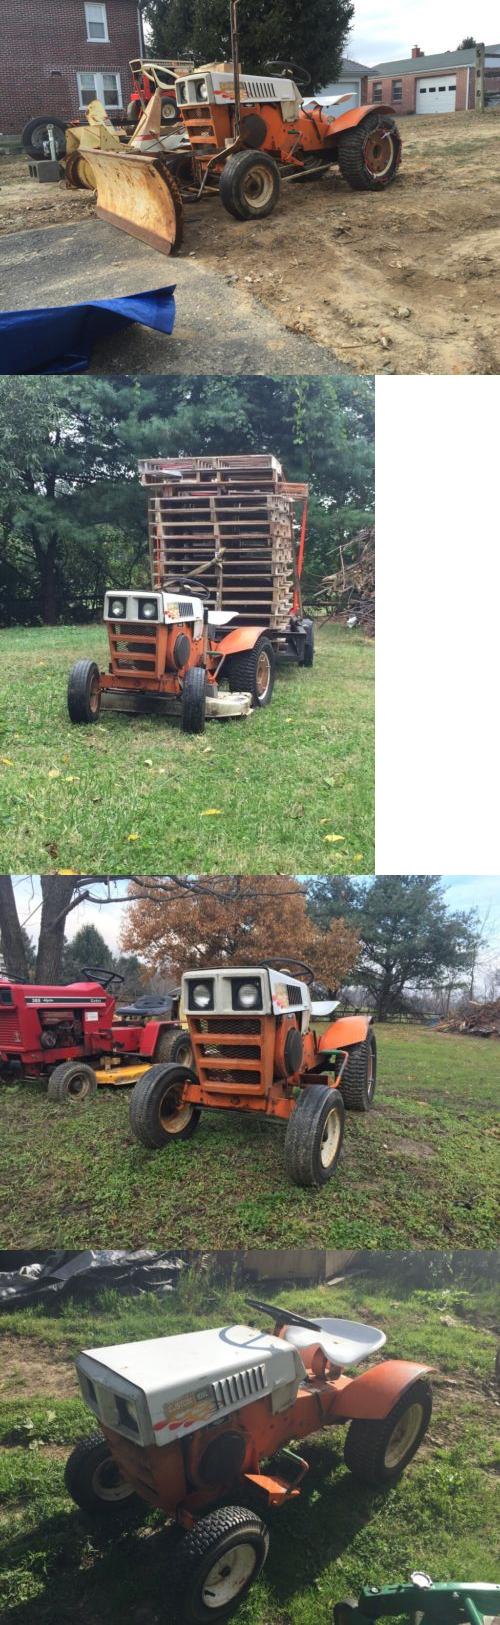 Riding Mowers 177021: Garden Tractor  1971 Sears Custom 10Xl